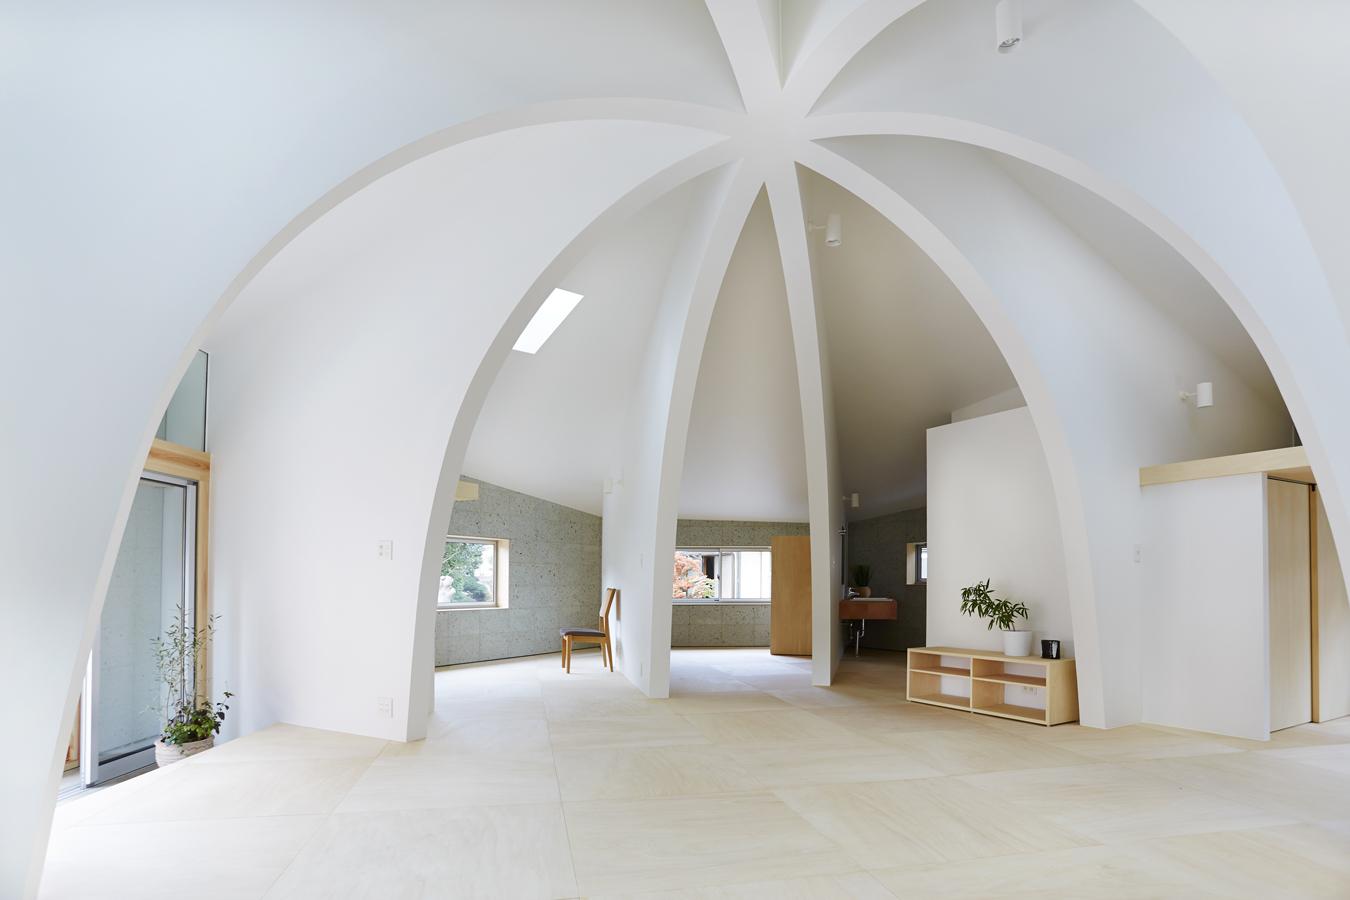 House i for a Family / Hiroyuki Shinozaki (4)